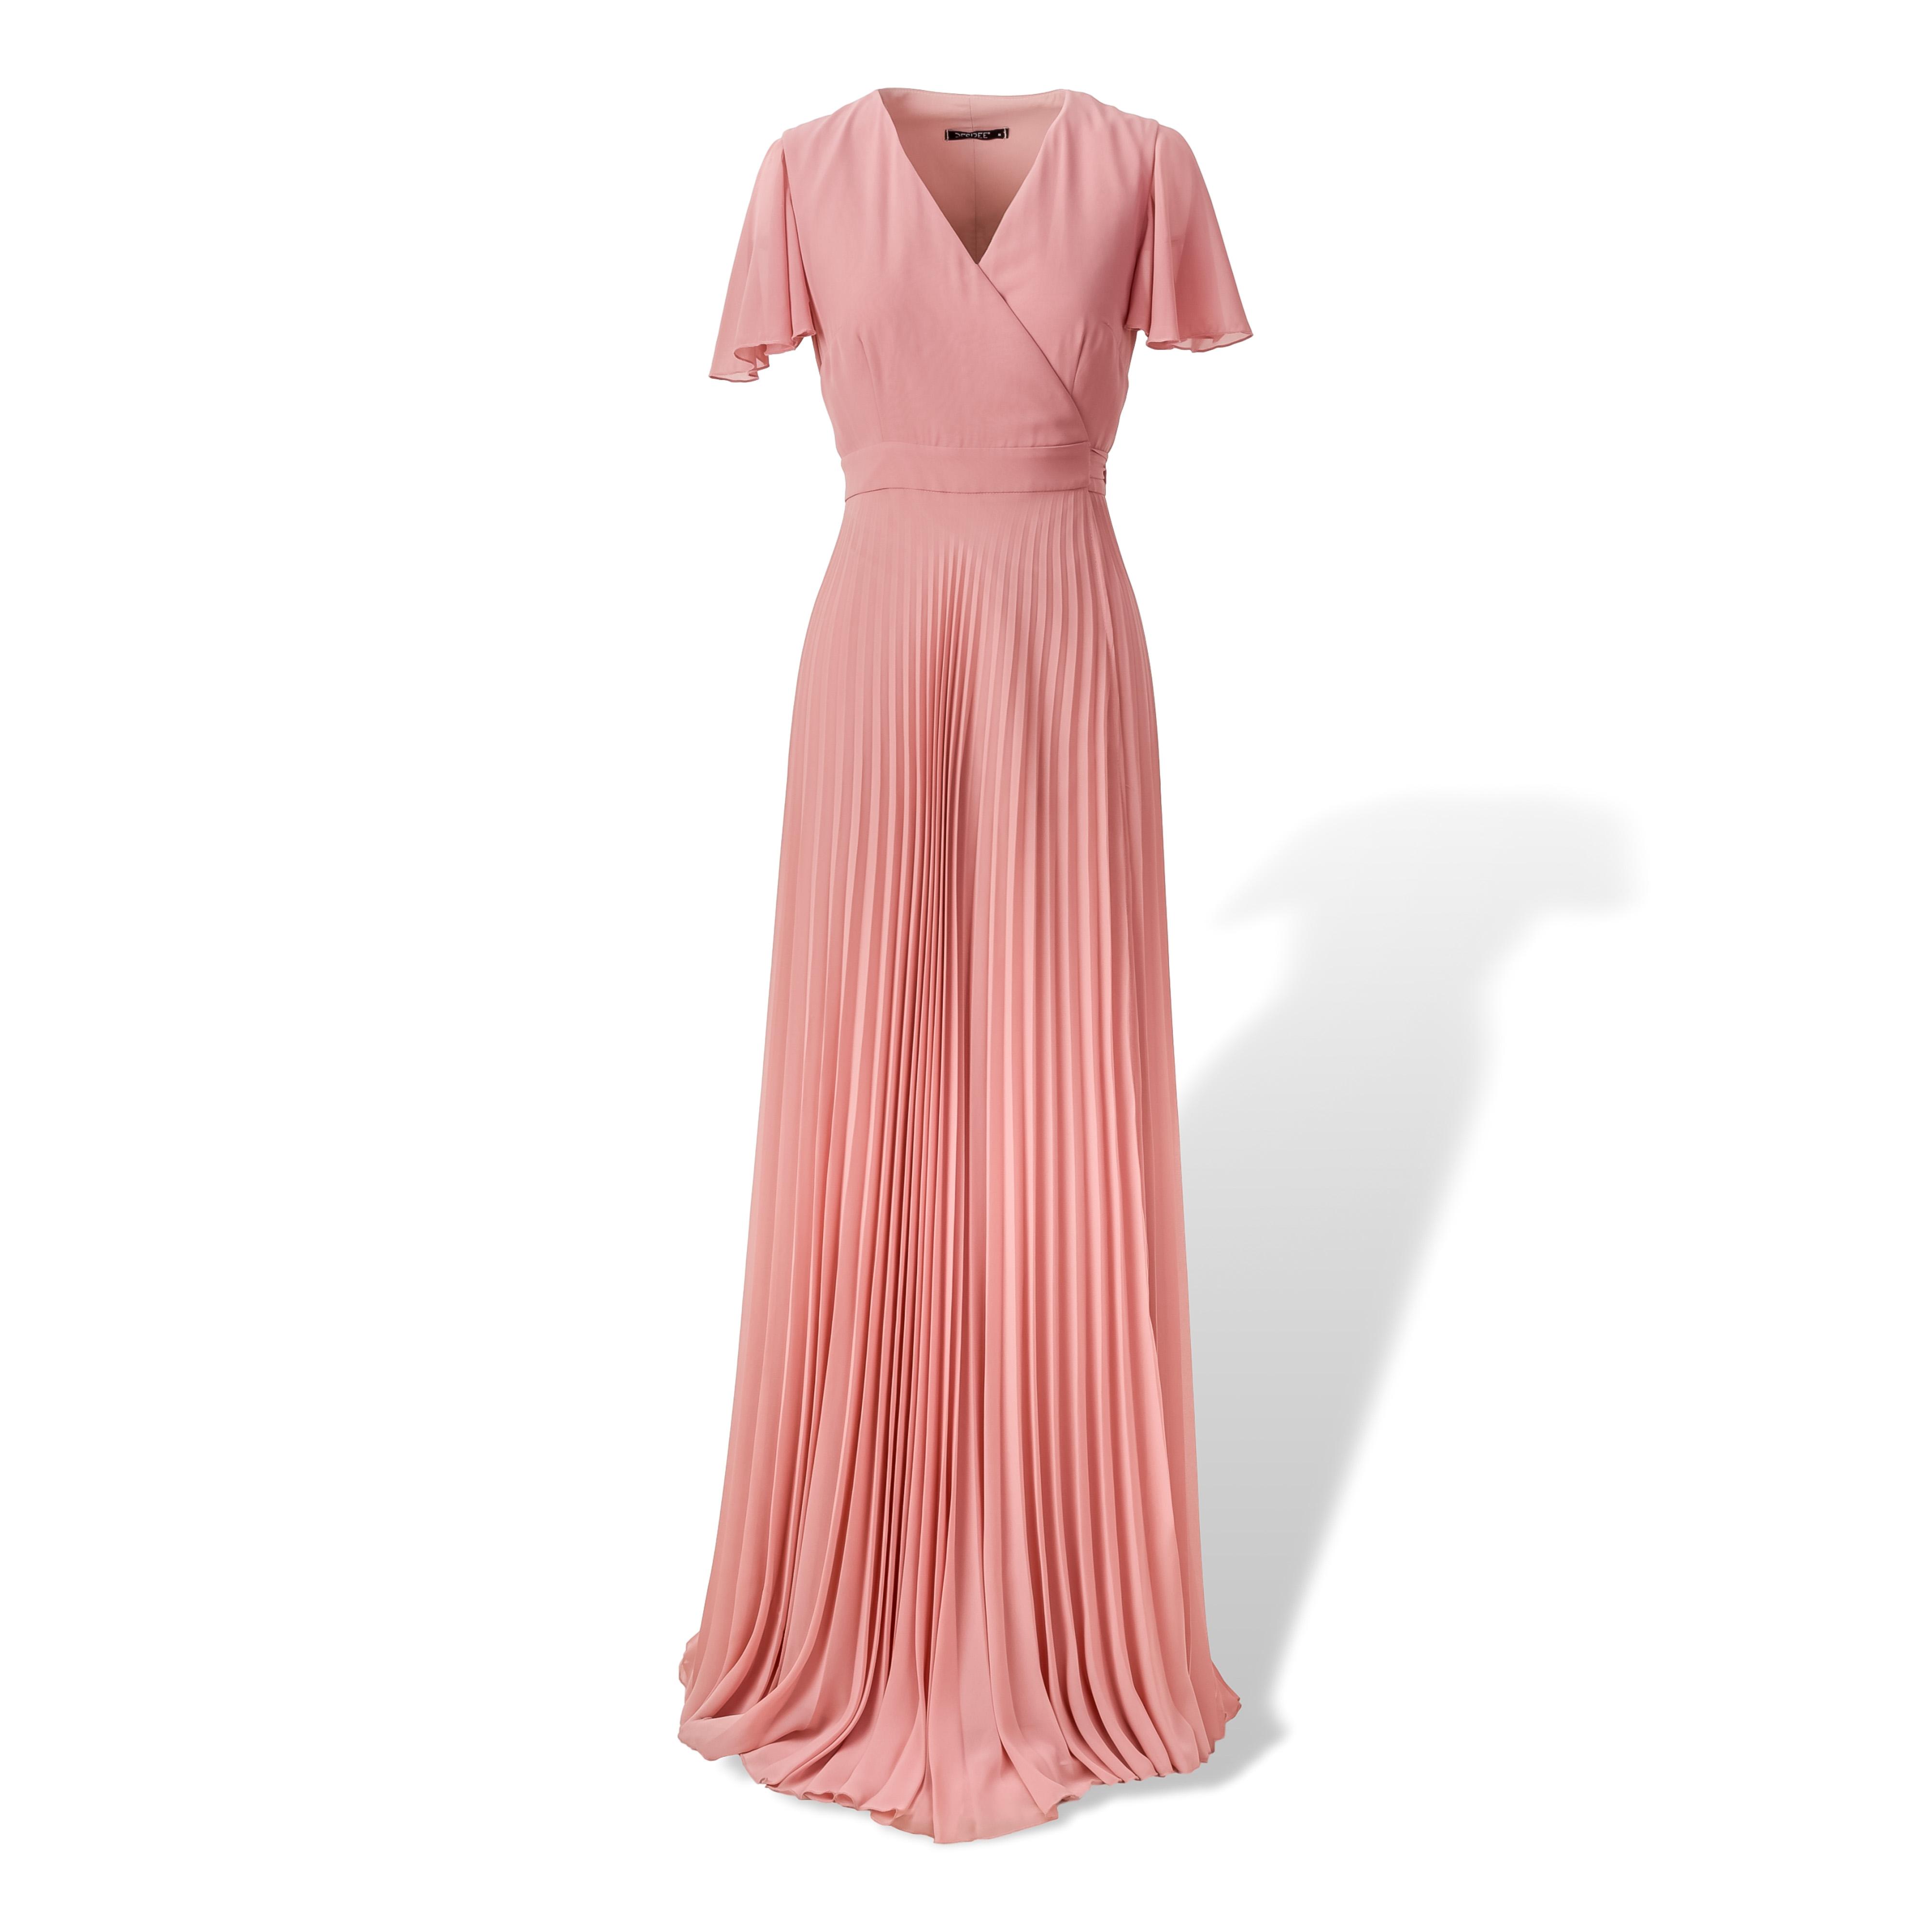 Maxi φόρεμα Κρουαζέ Πλισέ image